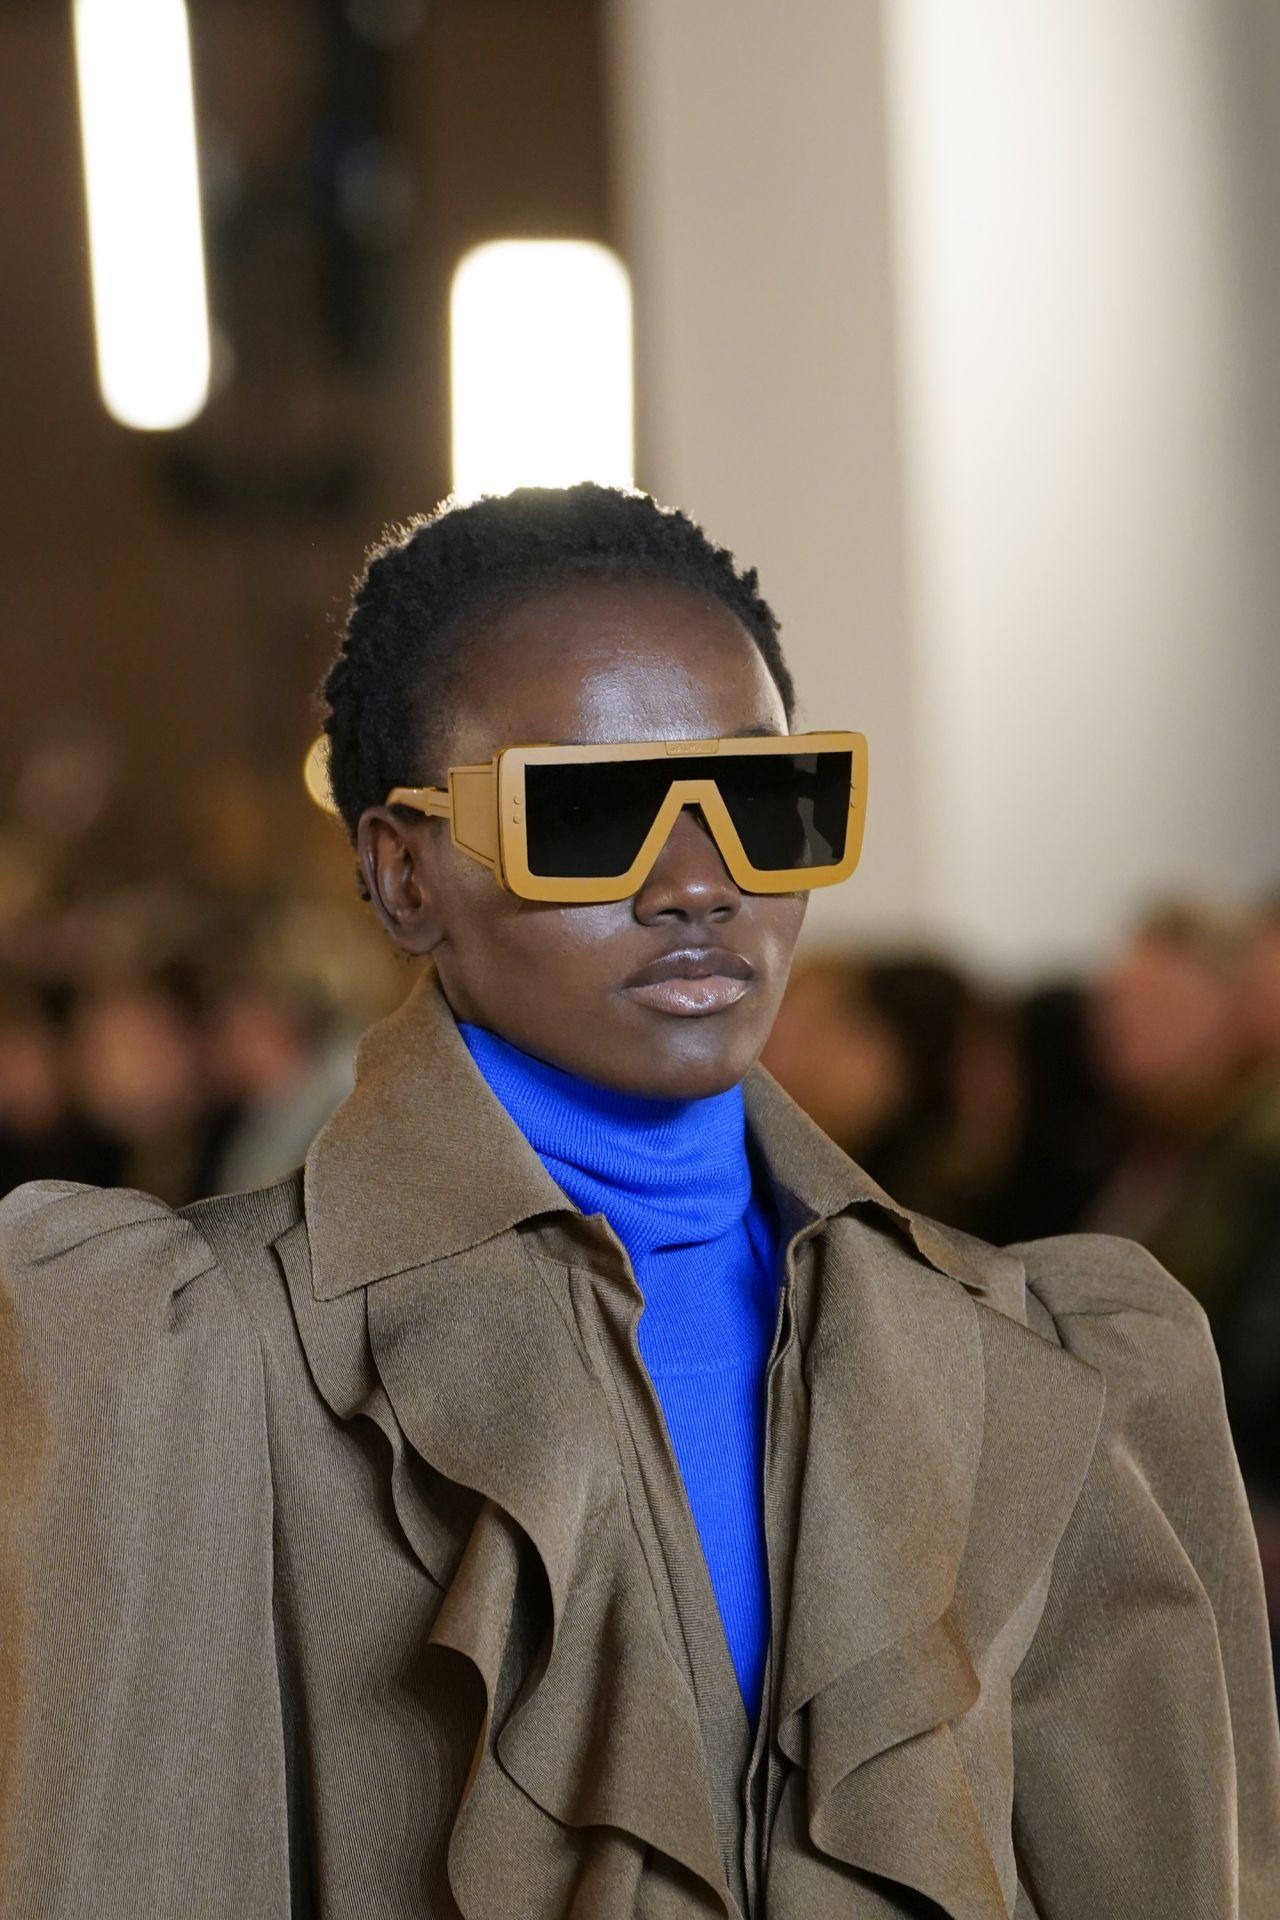 Balmain napszemüveg